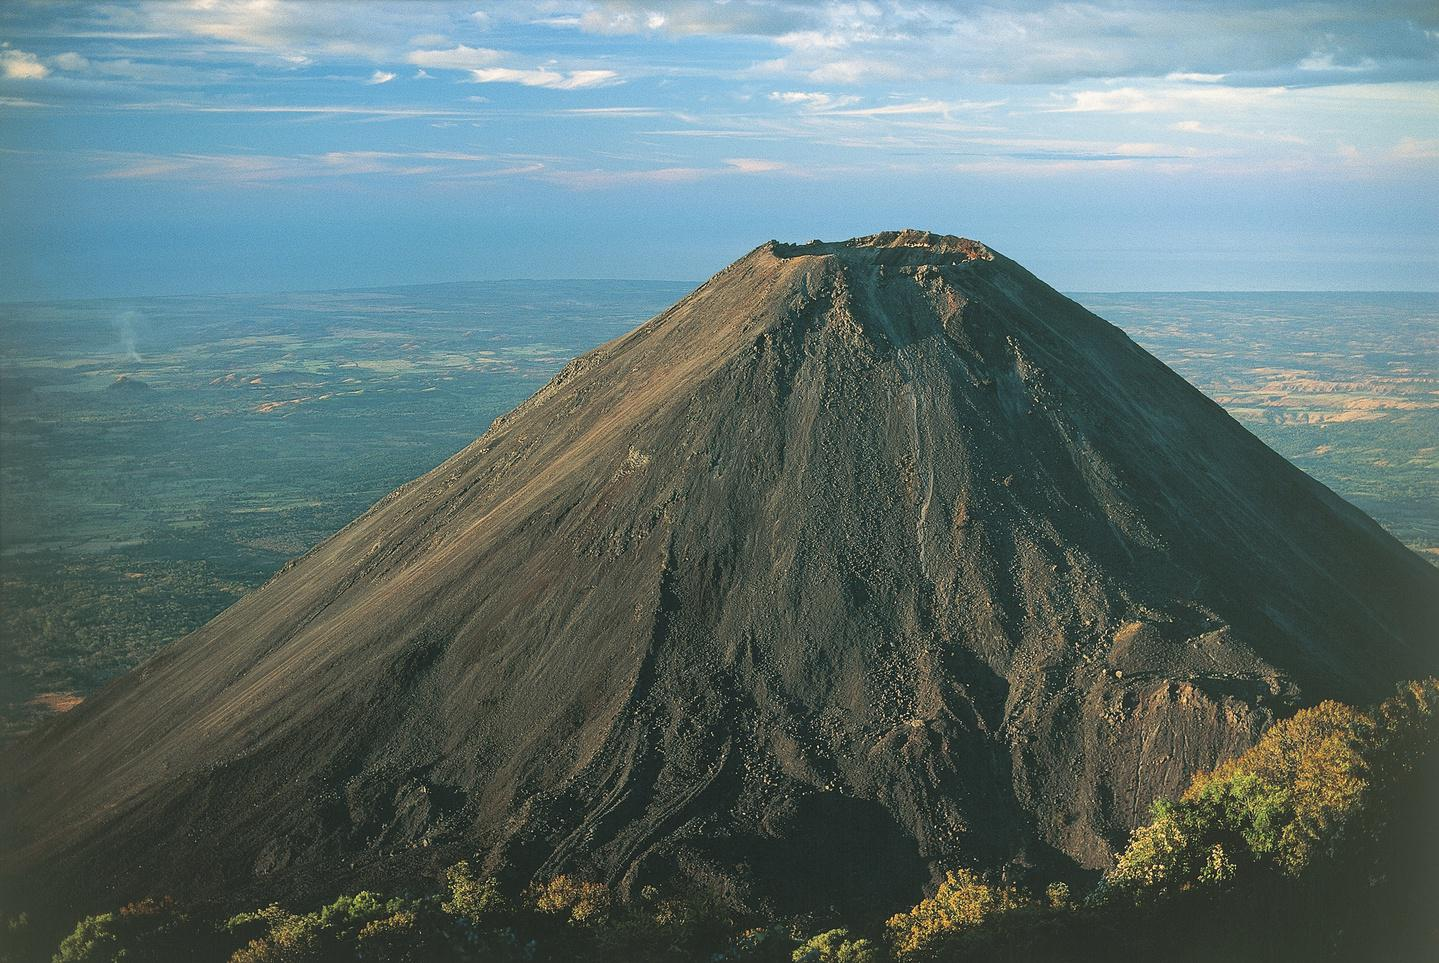 Valcano on a landscape, Izalco, Sonsonate, El Salvador